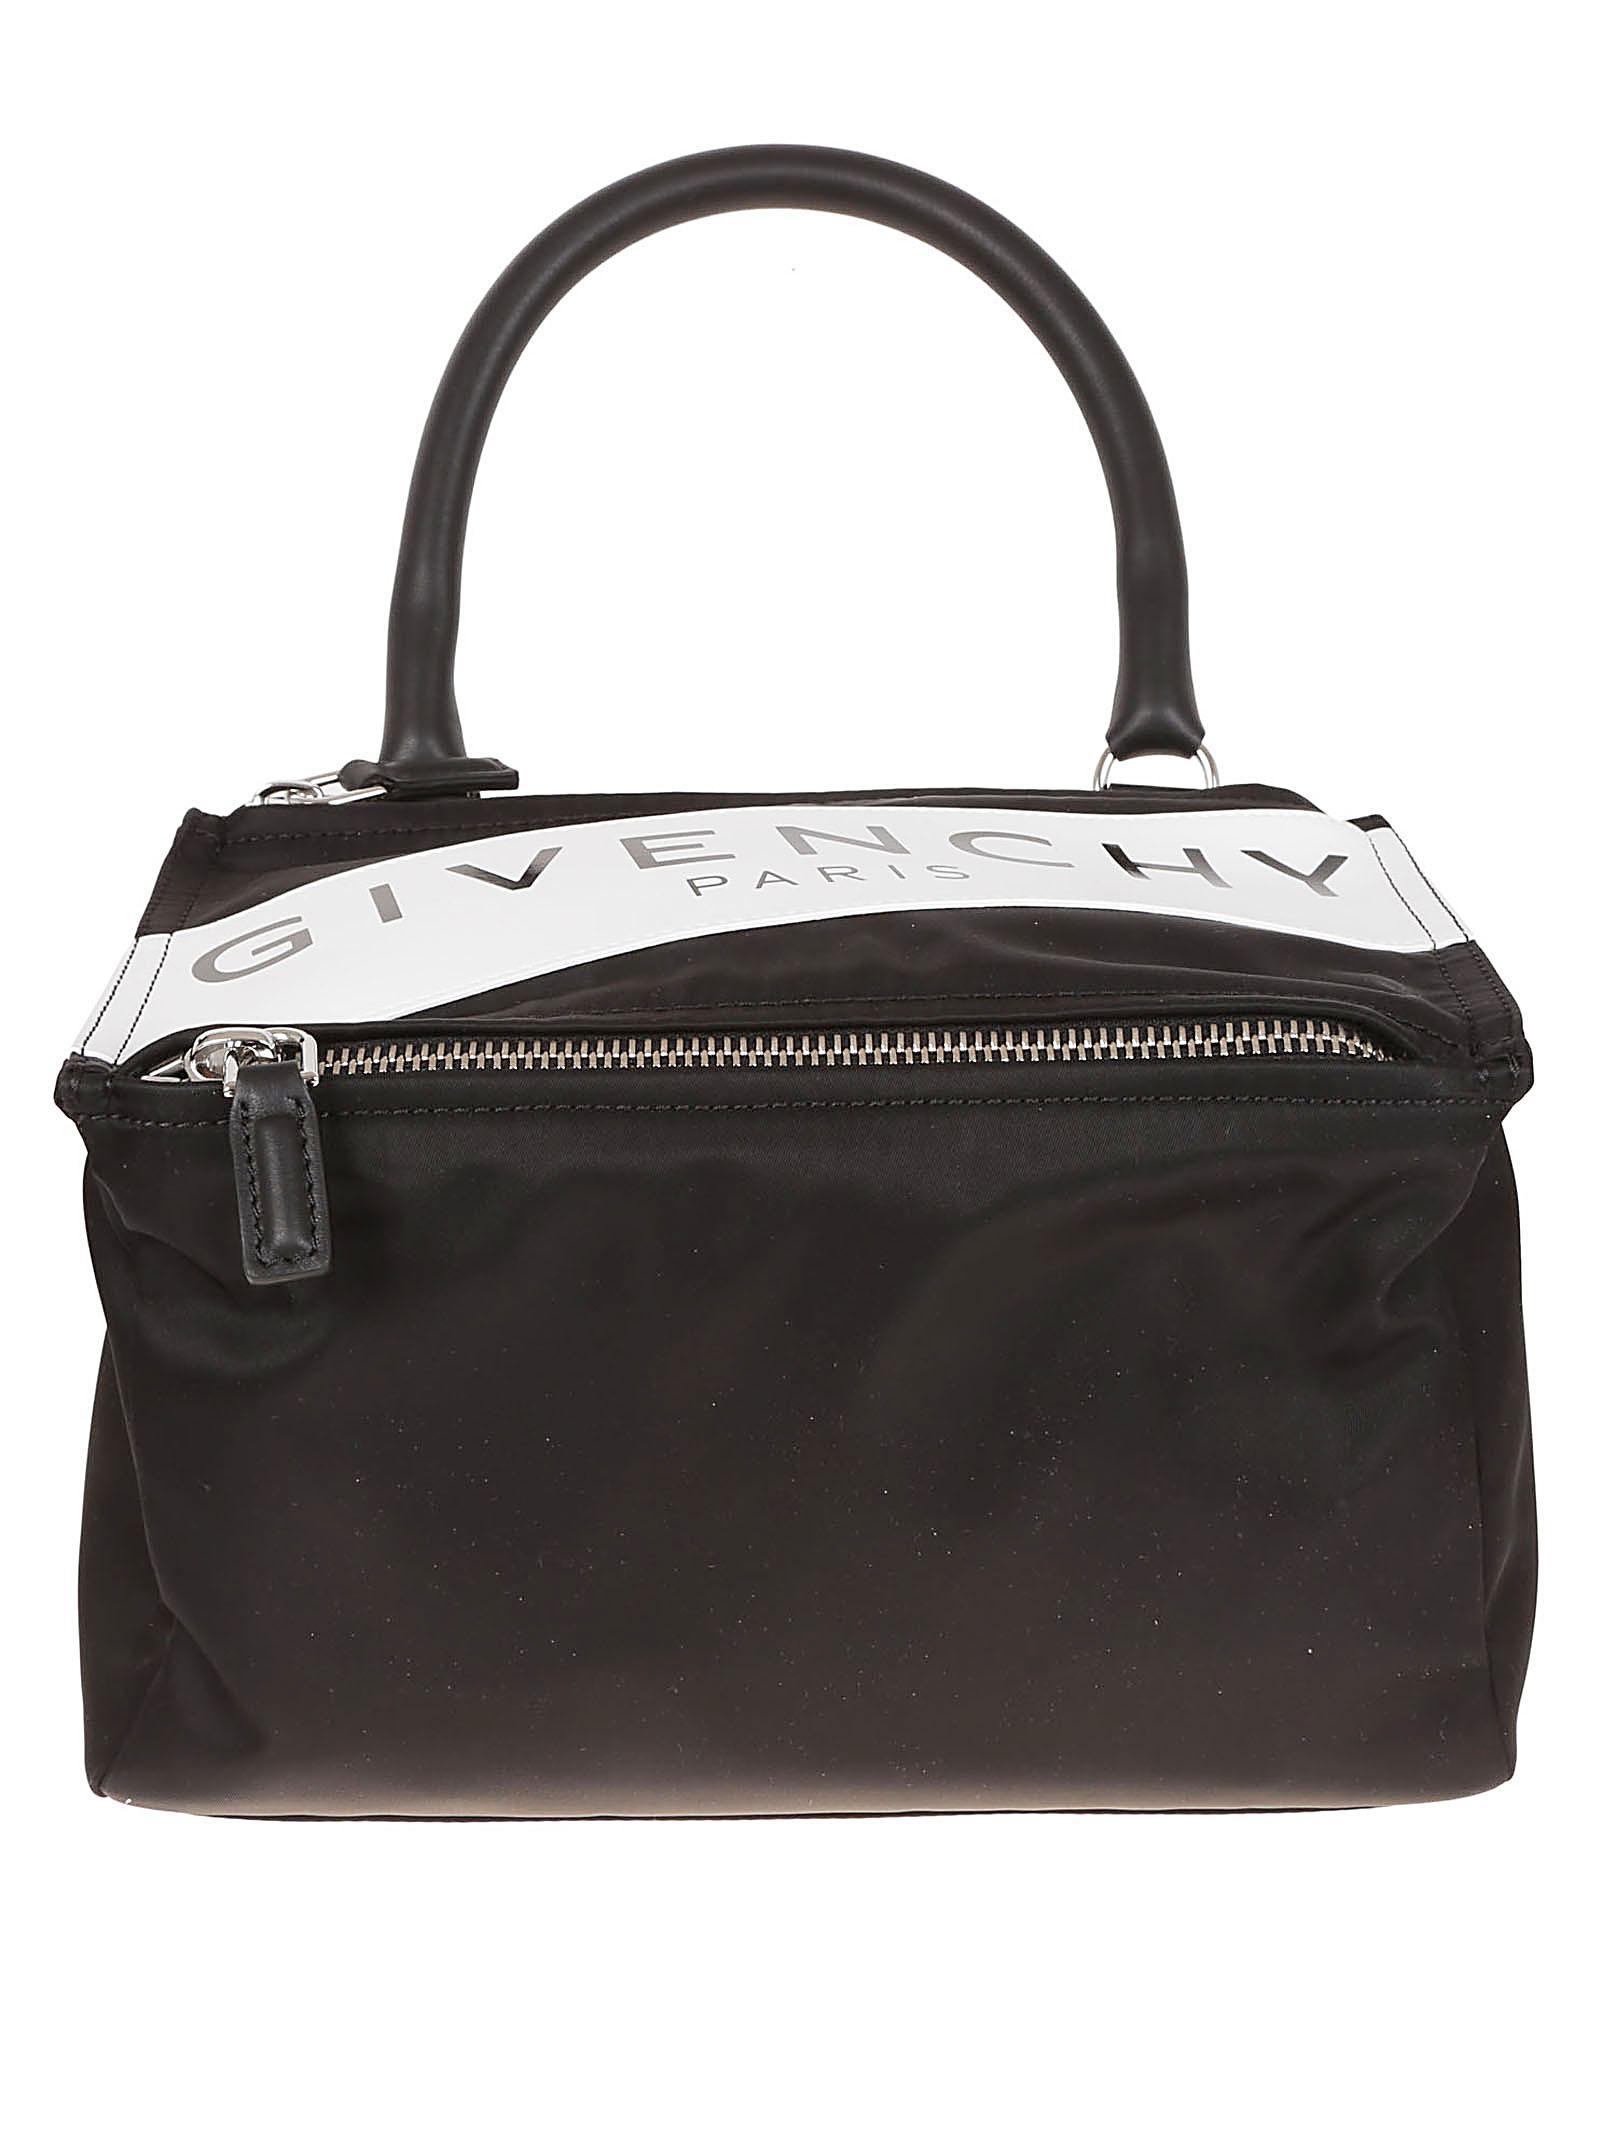 e64ec255ec70 Givenchy Pandora - Small Bag in Black - Lyst